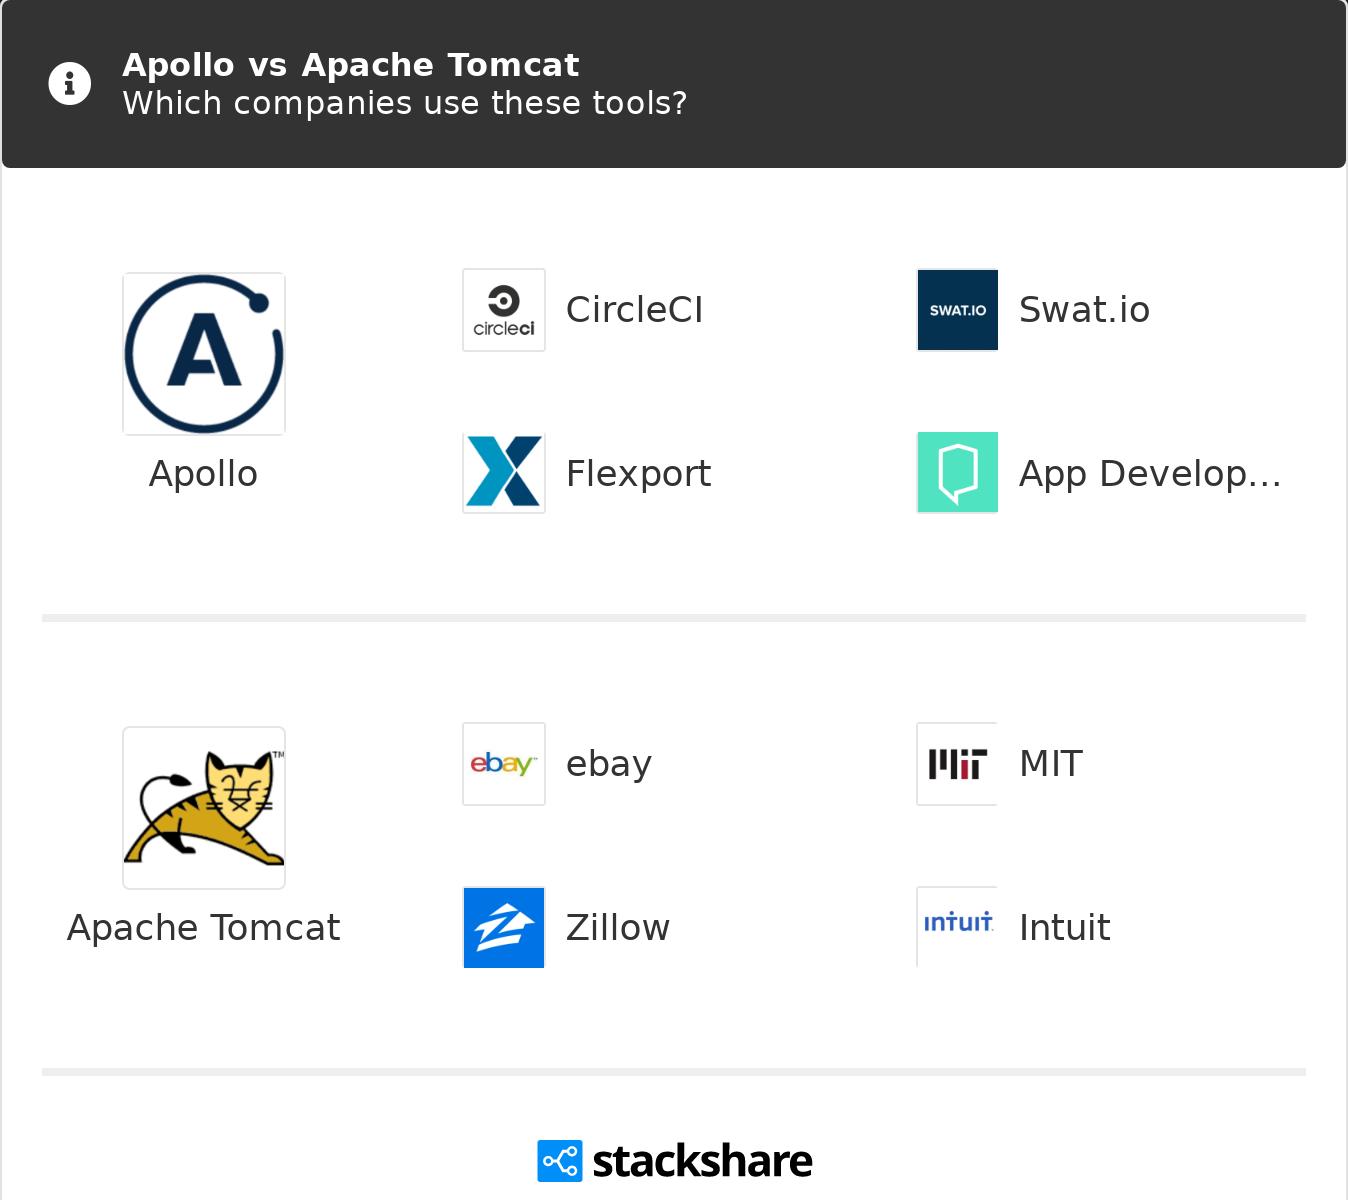 Apollo vs Apache Tomcat | What are the differences?